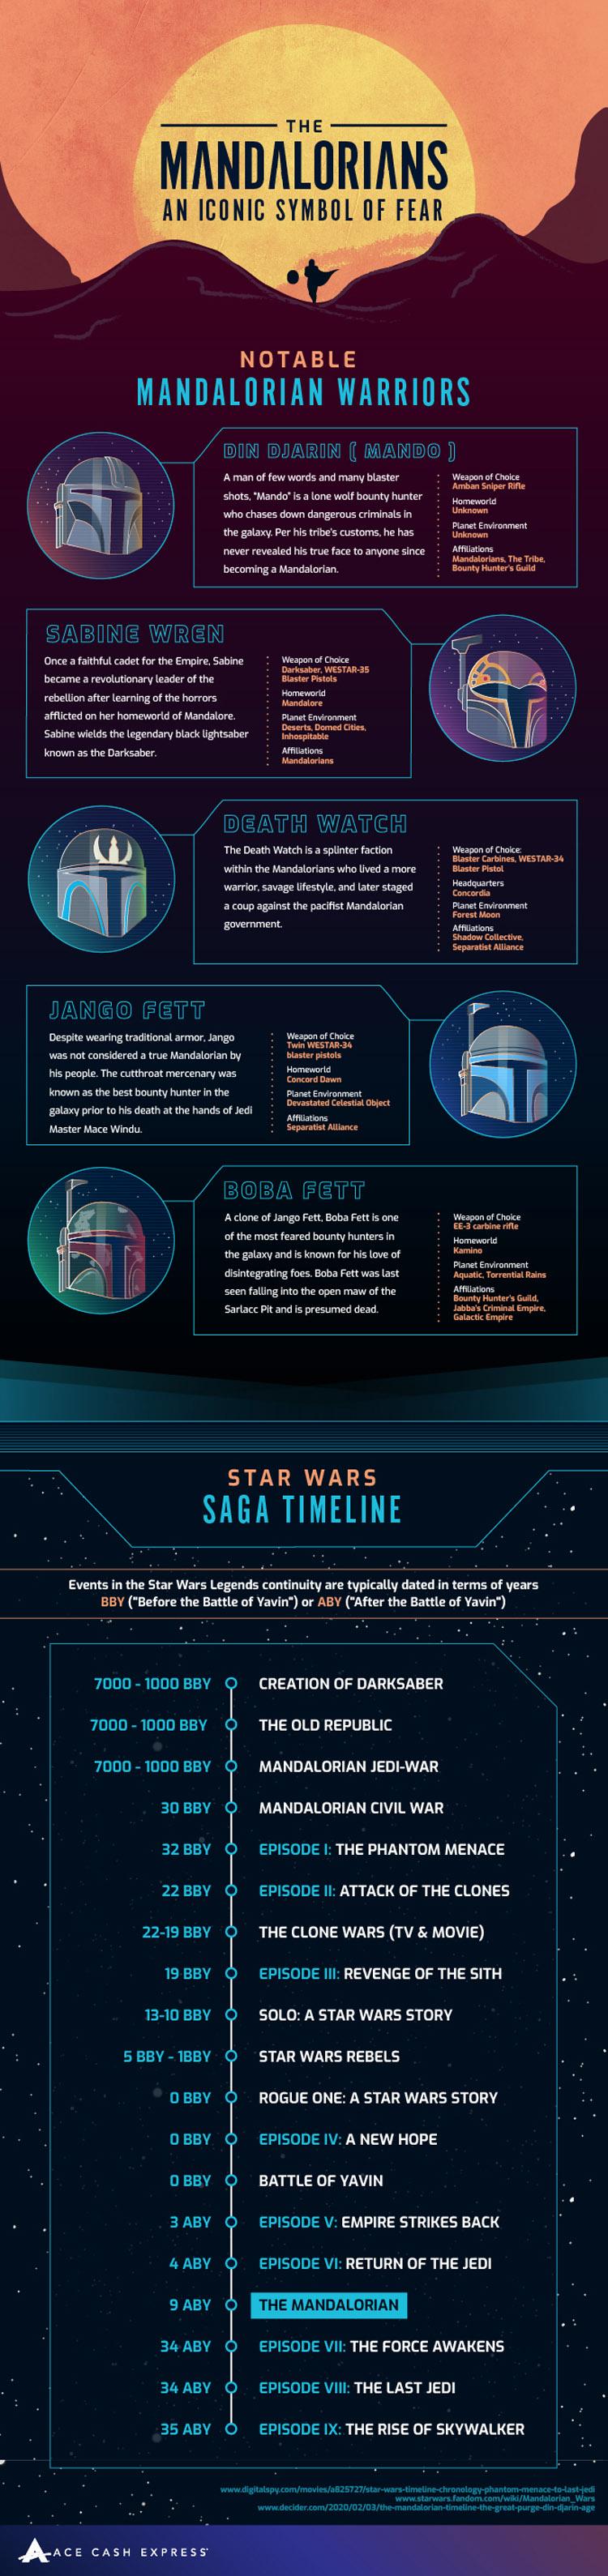 Star Wars Most Feared Warriors: The Mandalorians